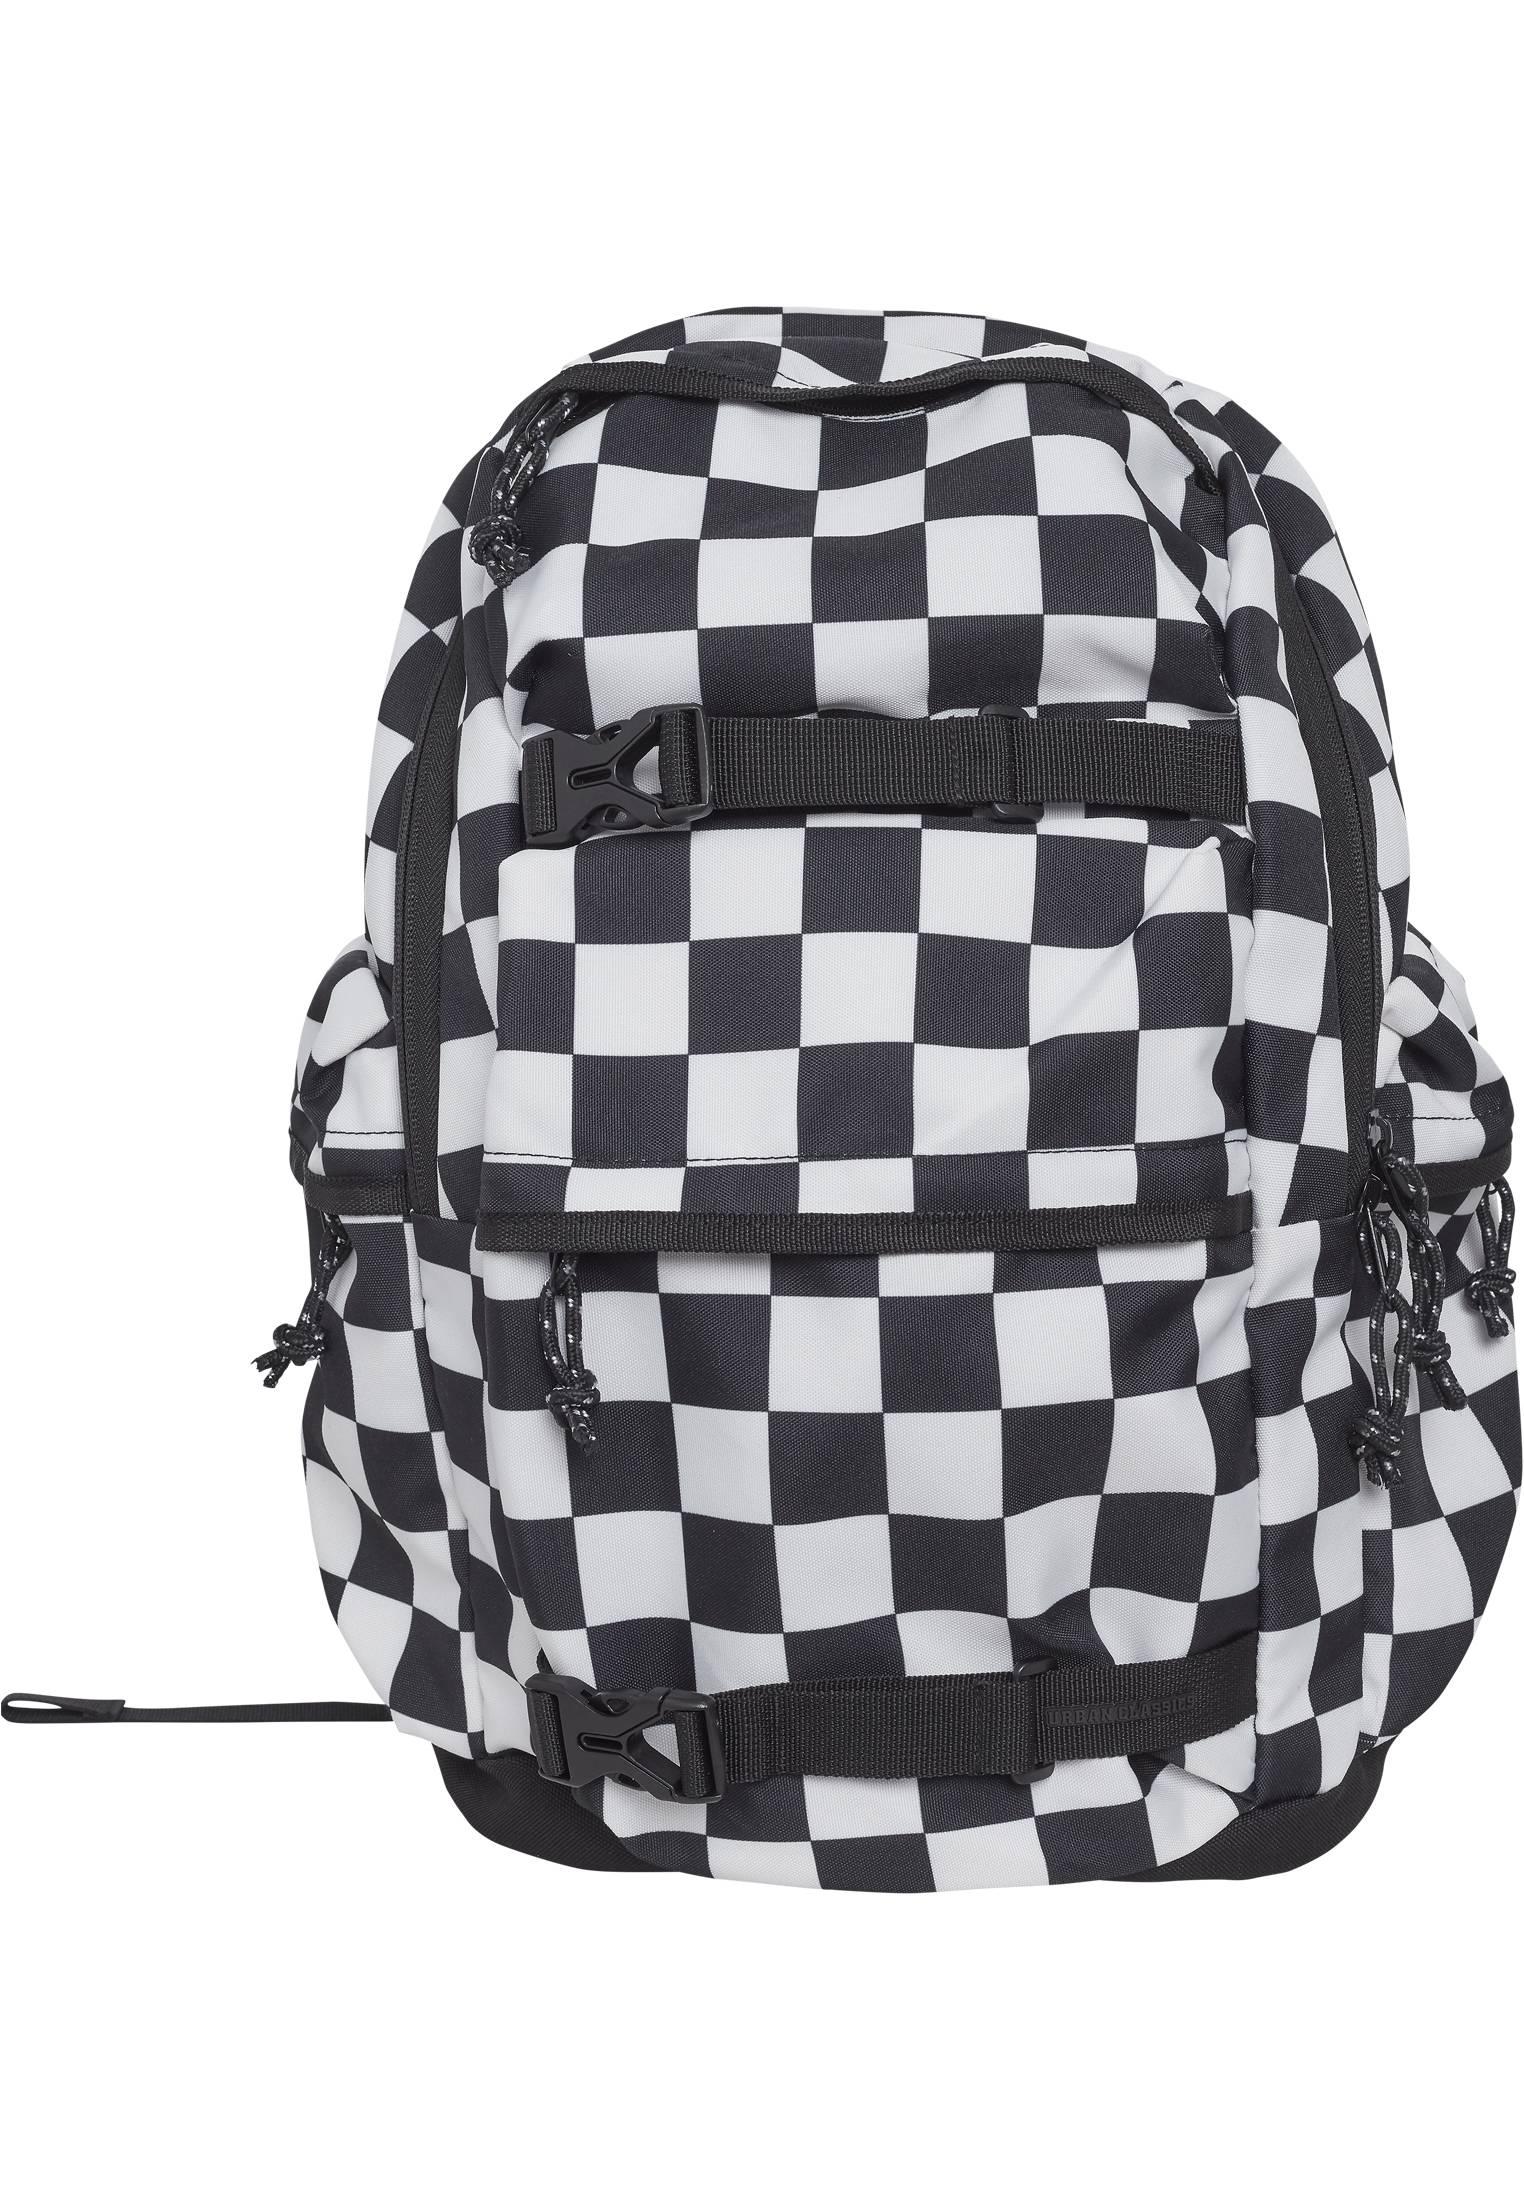 Urban Classics Backpack Checker black & white black/white - One Size